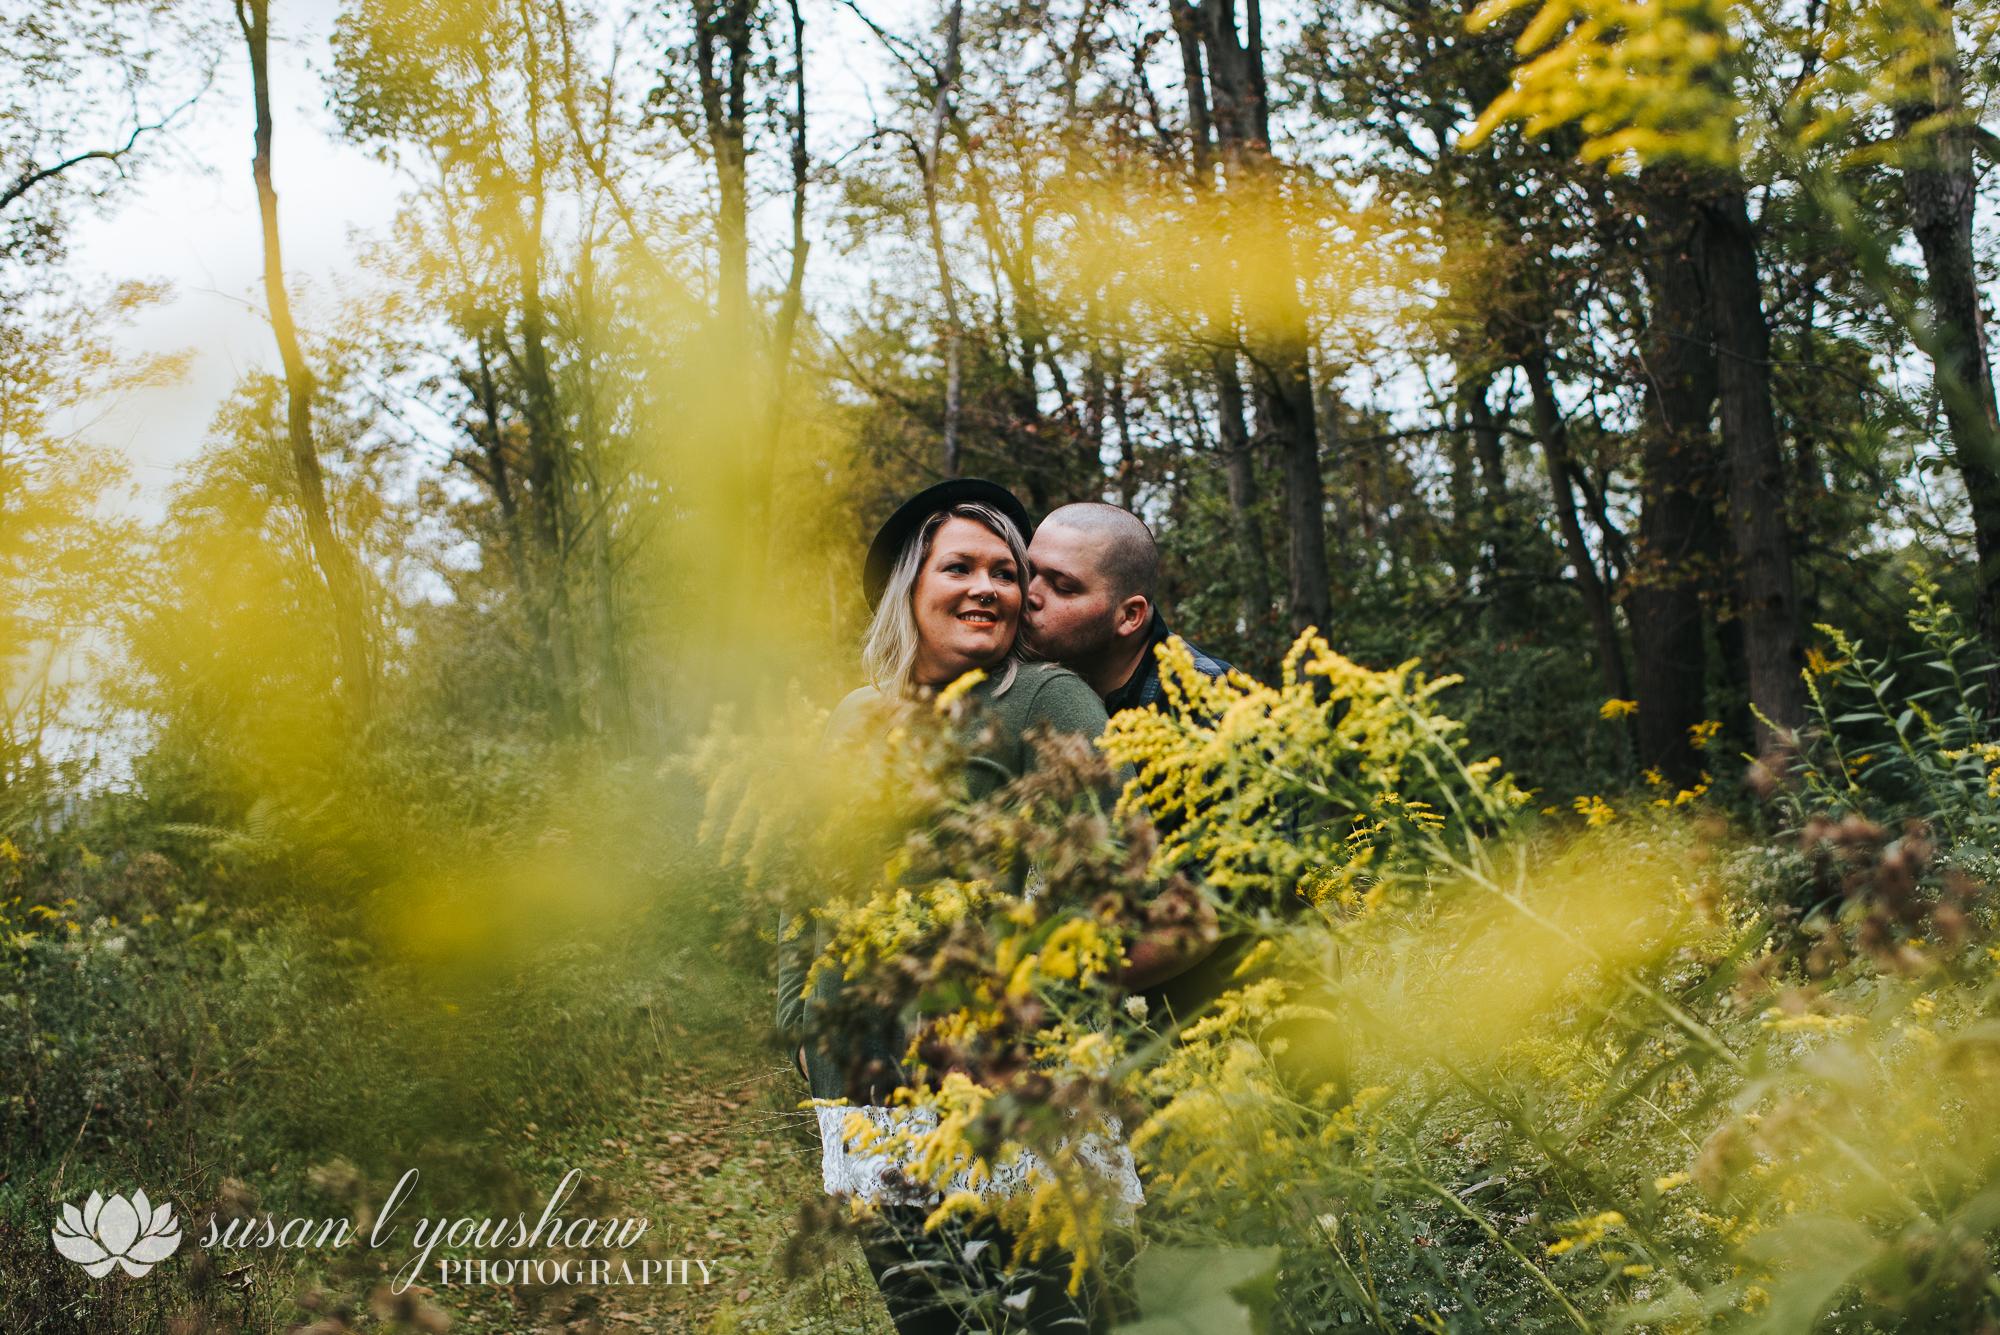 BLOG Heather 09-23-2018 SLY photography LLC-8.jpg